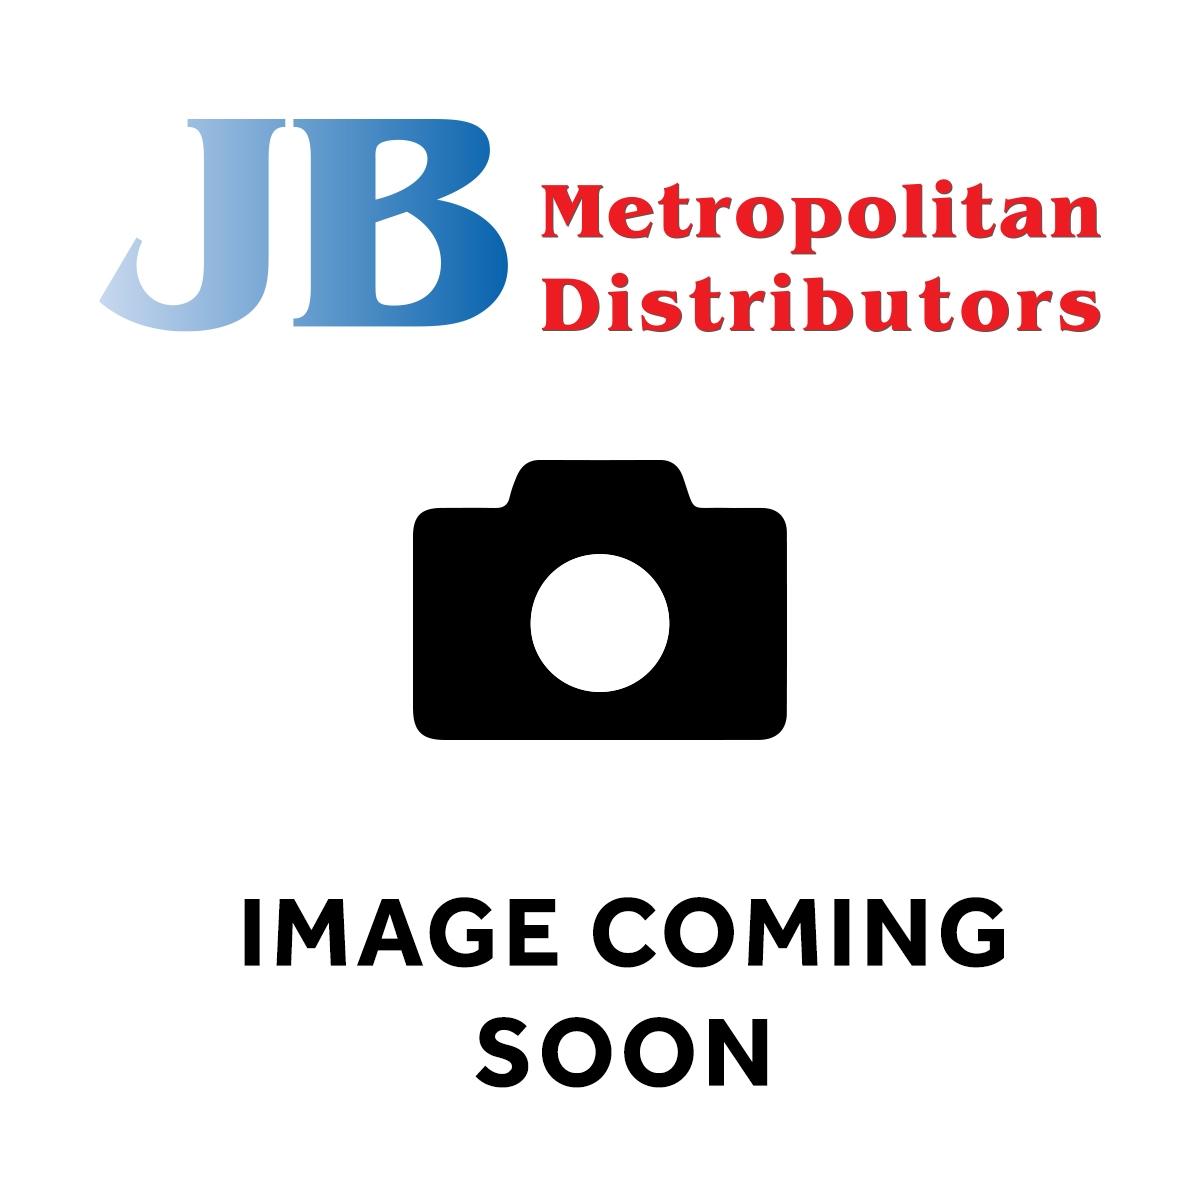 440G GOLDEN CIRCLE PINEAPPLE SLICED NATURAL JUICE